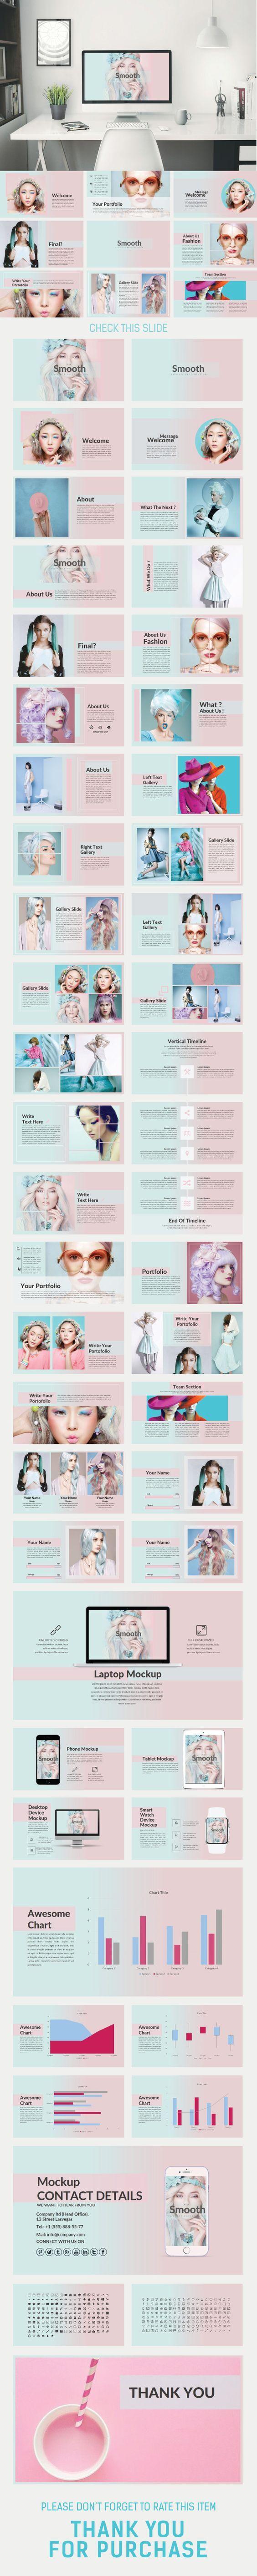 284 best PowerPoint Templates - Best images on Pinterest ...